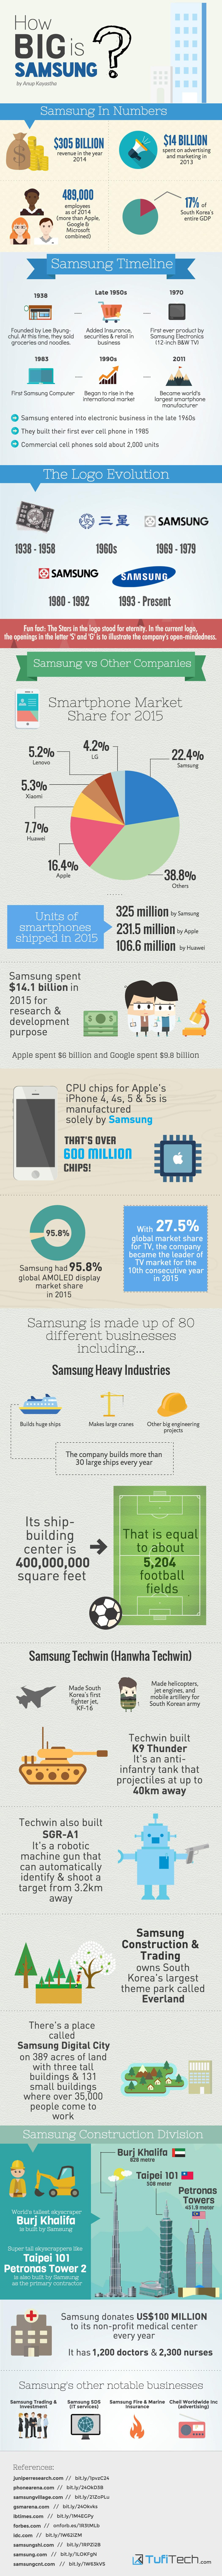 How Big Is Samsung?